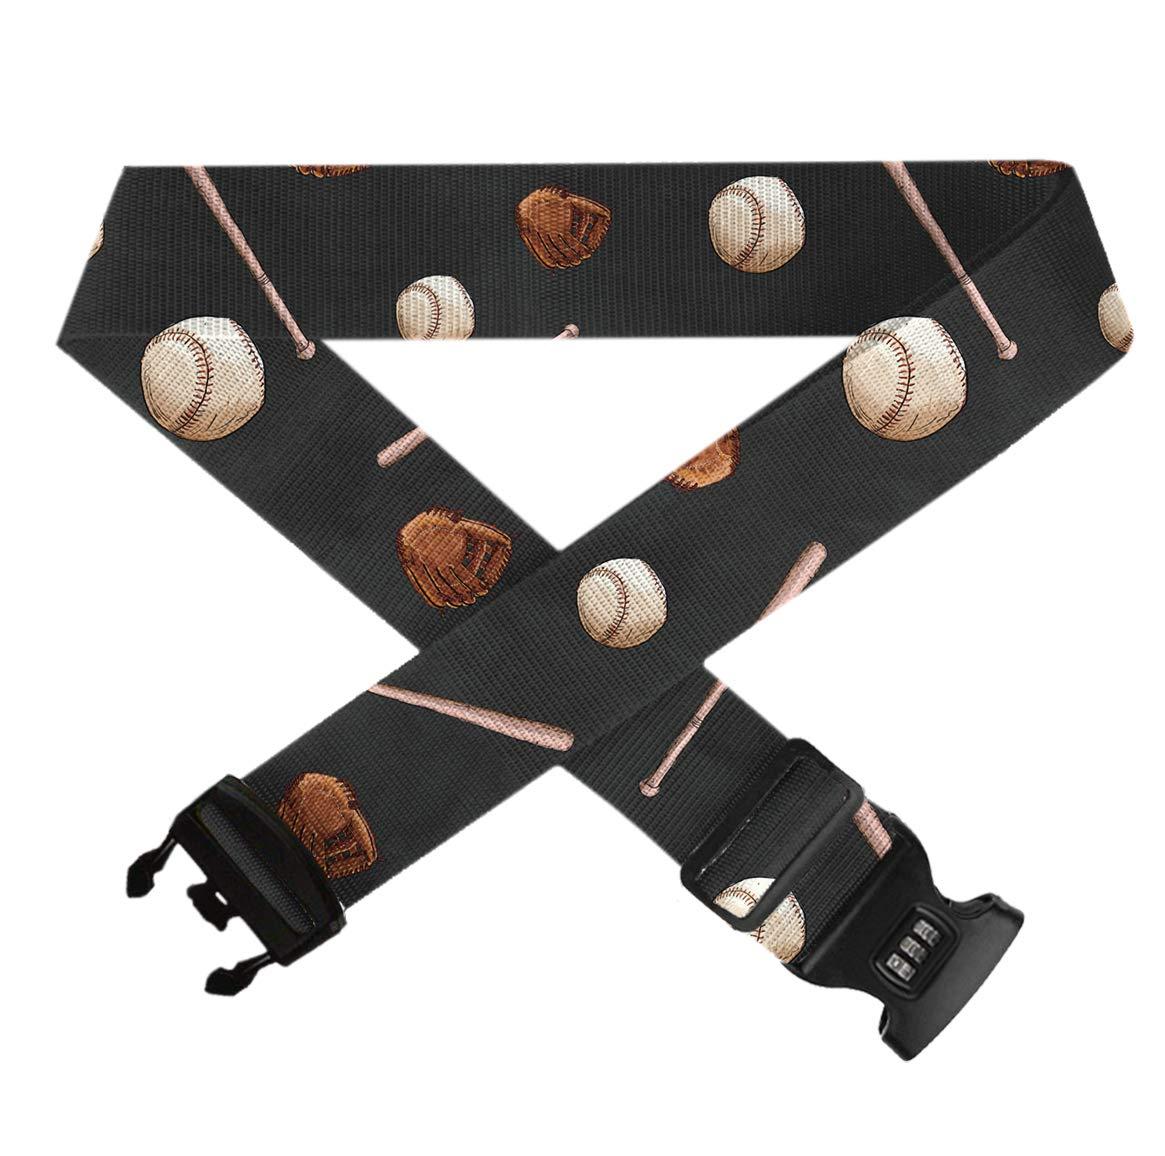 Travel Luggage Straps 1 Pack Suitcase Belt Adjustable Luggage Strap TSA 3-dial Combination Lock GLORY ART Baseball Ball Bat